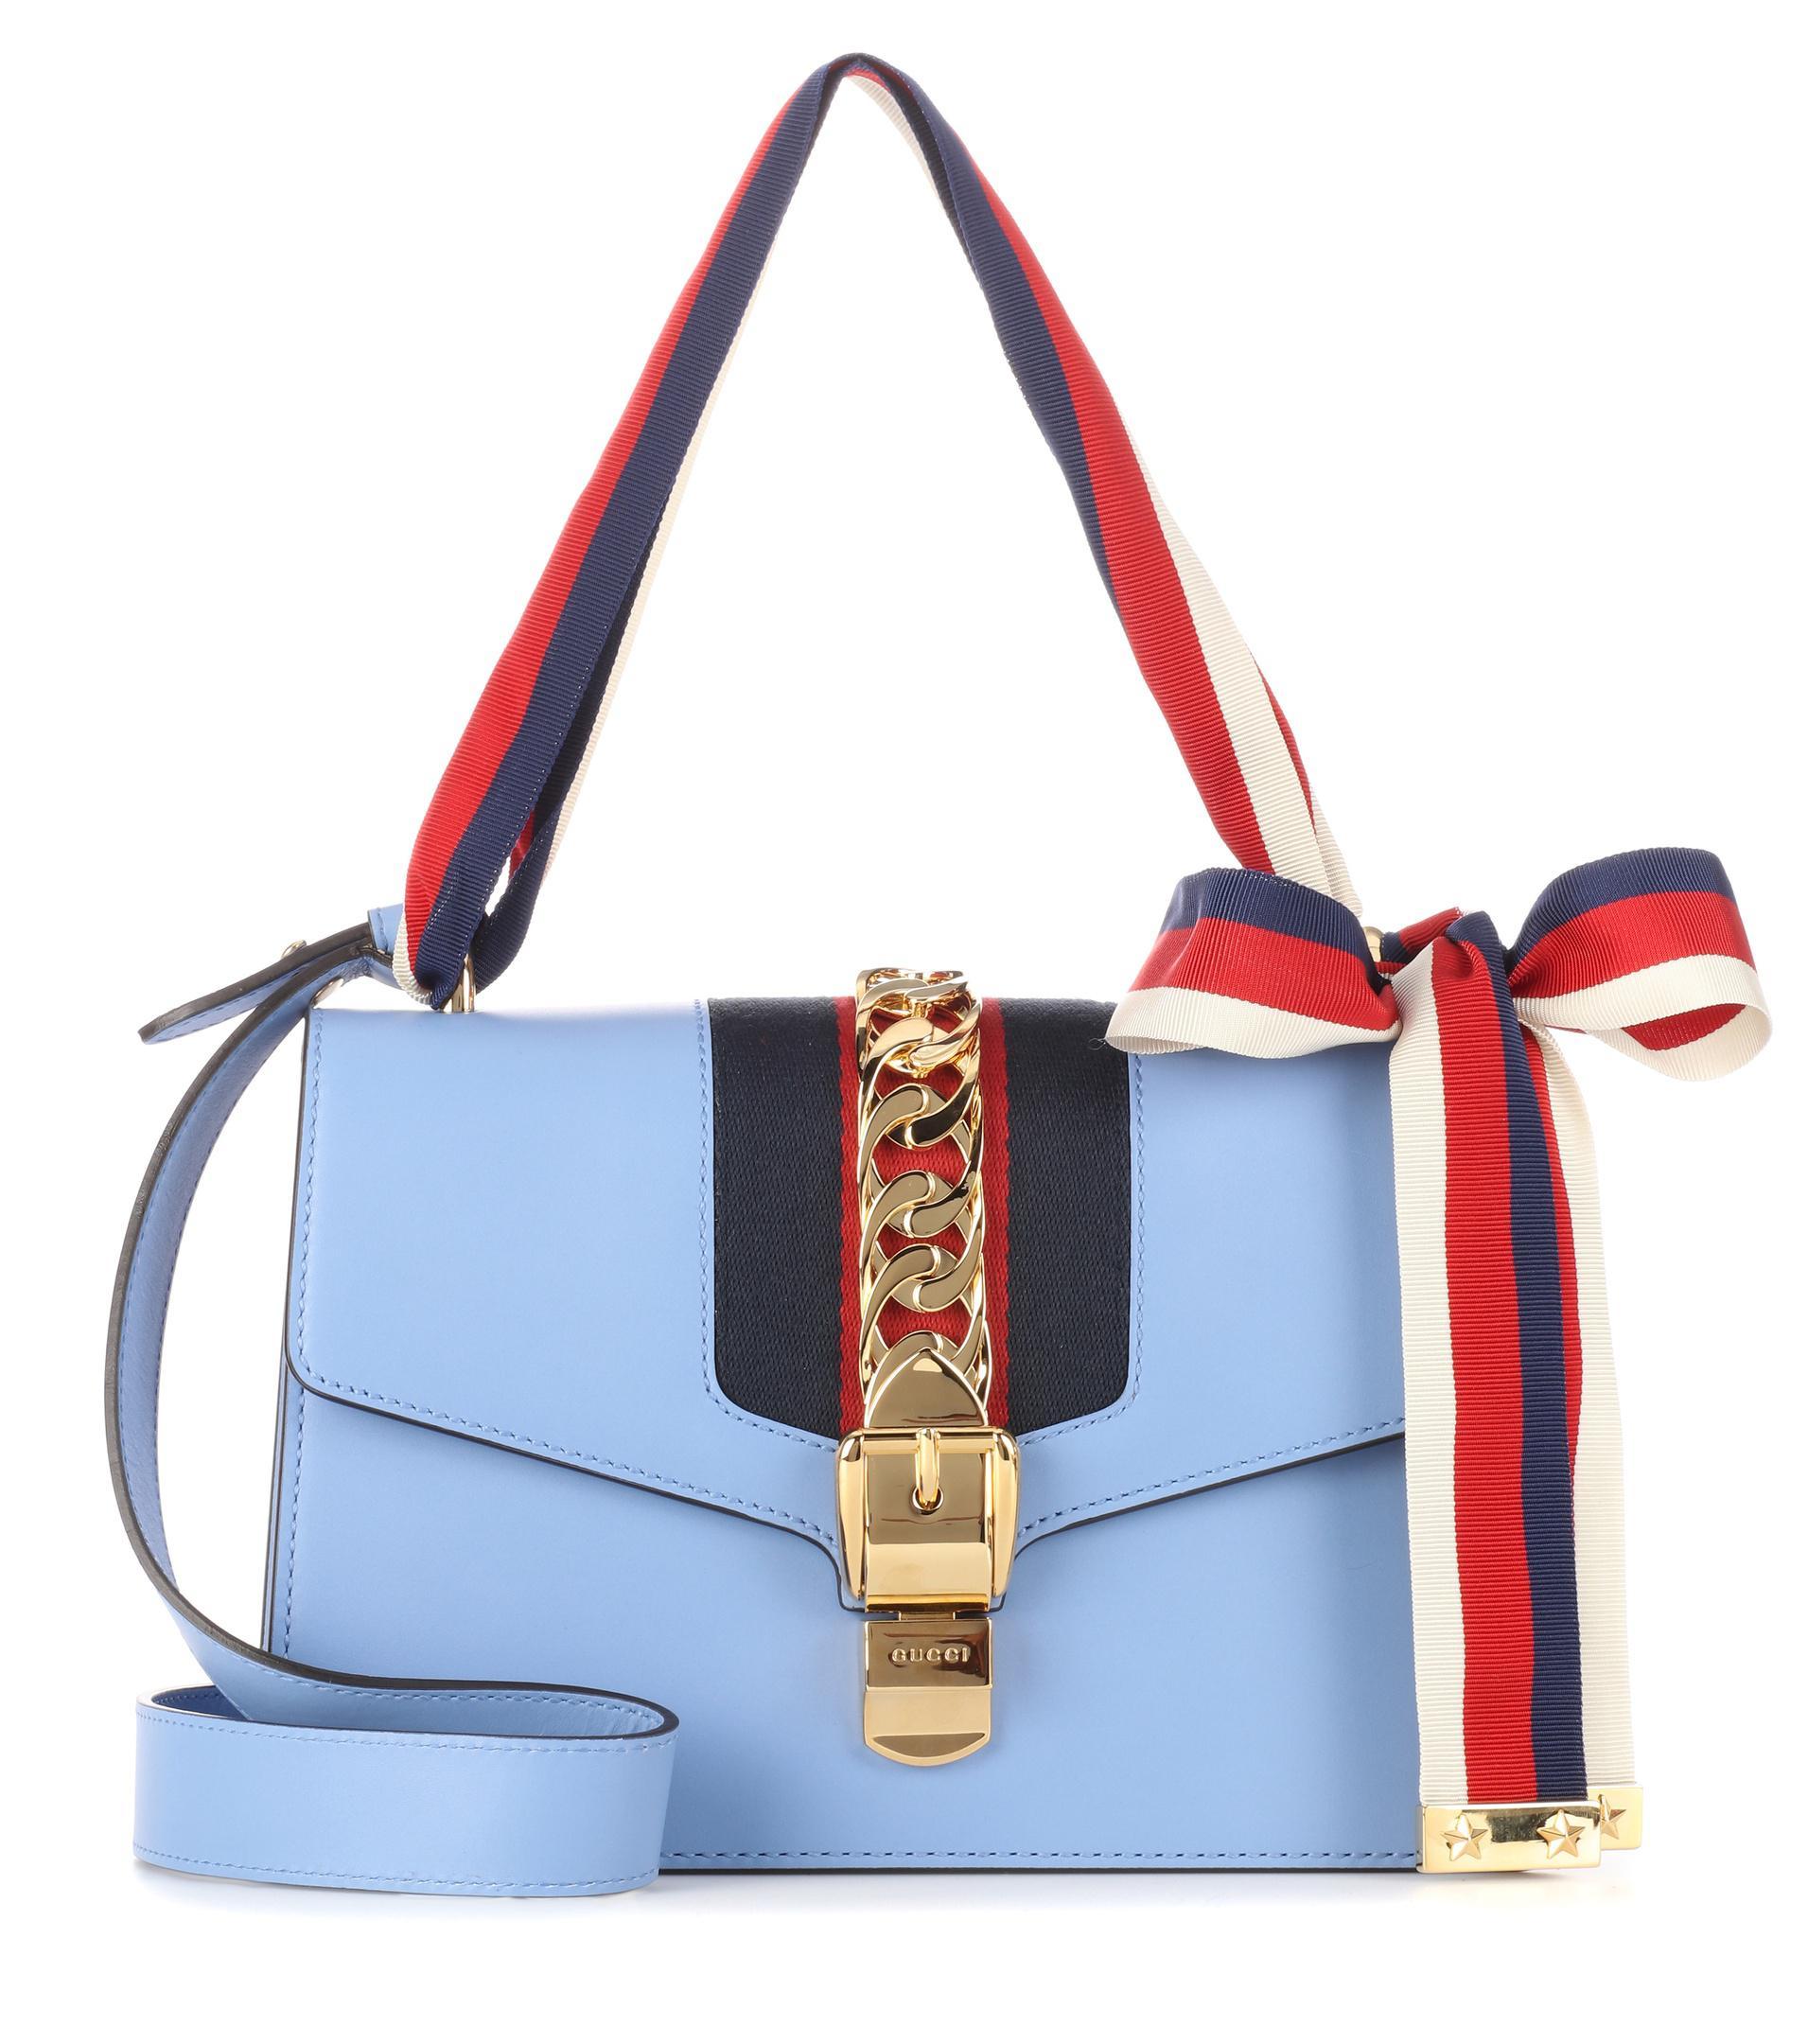 a50d9da6140 Lyst - Gucci  sylvie  Light Blue Shoulder Bag in Blue